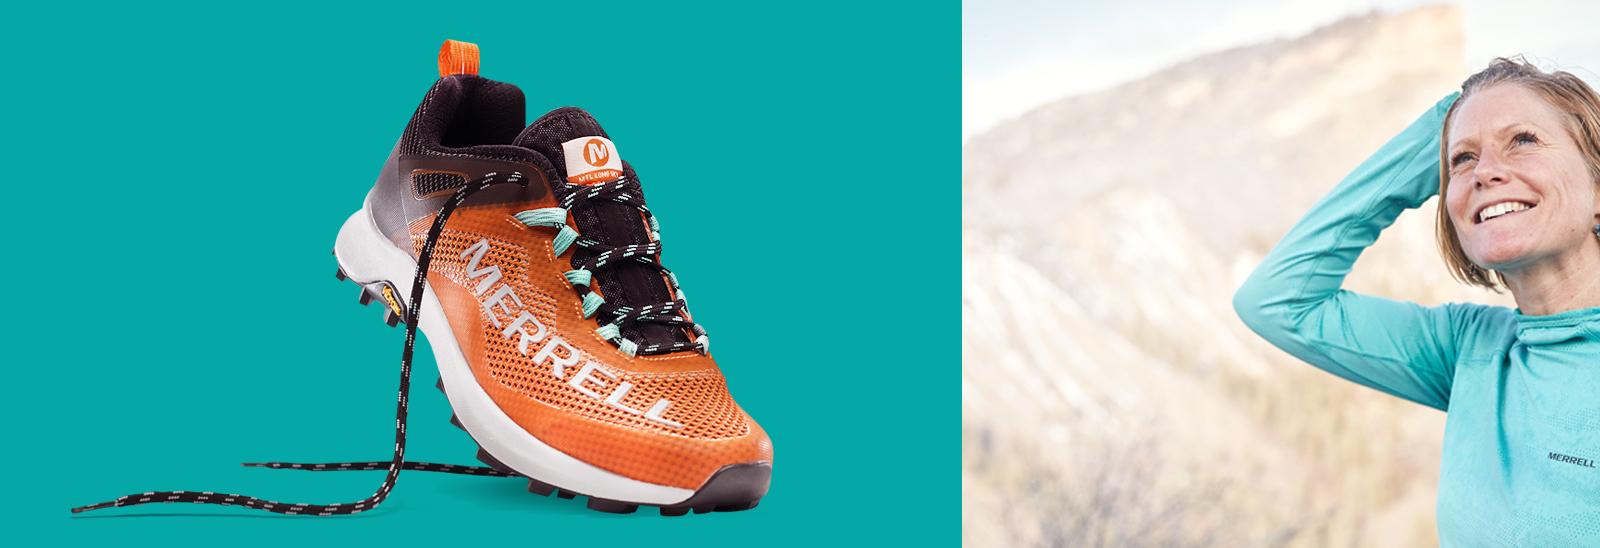 Tread of Merrell's Arctic Grip Boot.